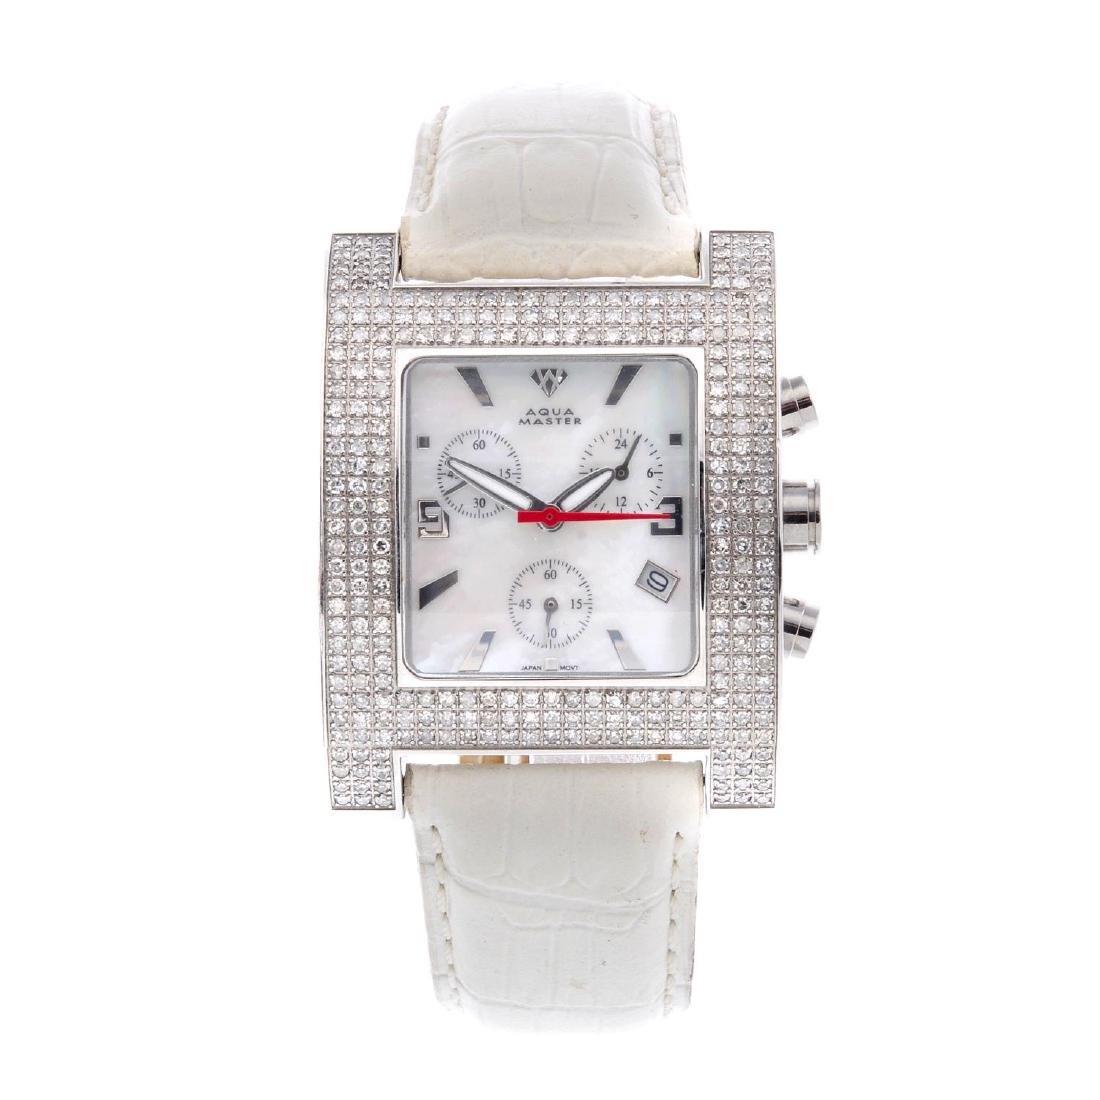 AQUA MASTER - a lady's chronograph wrist watch.